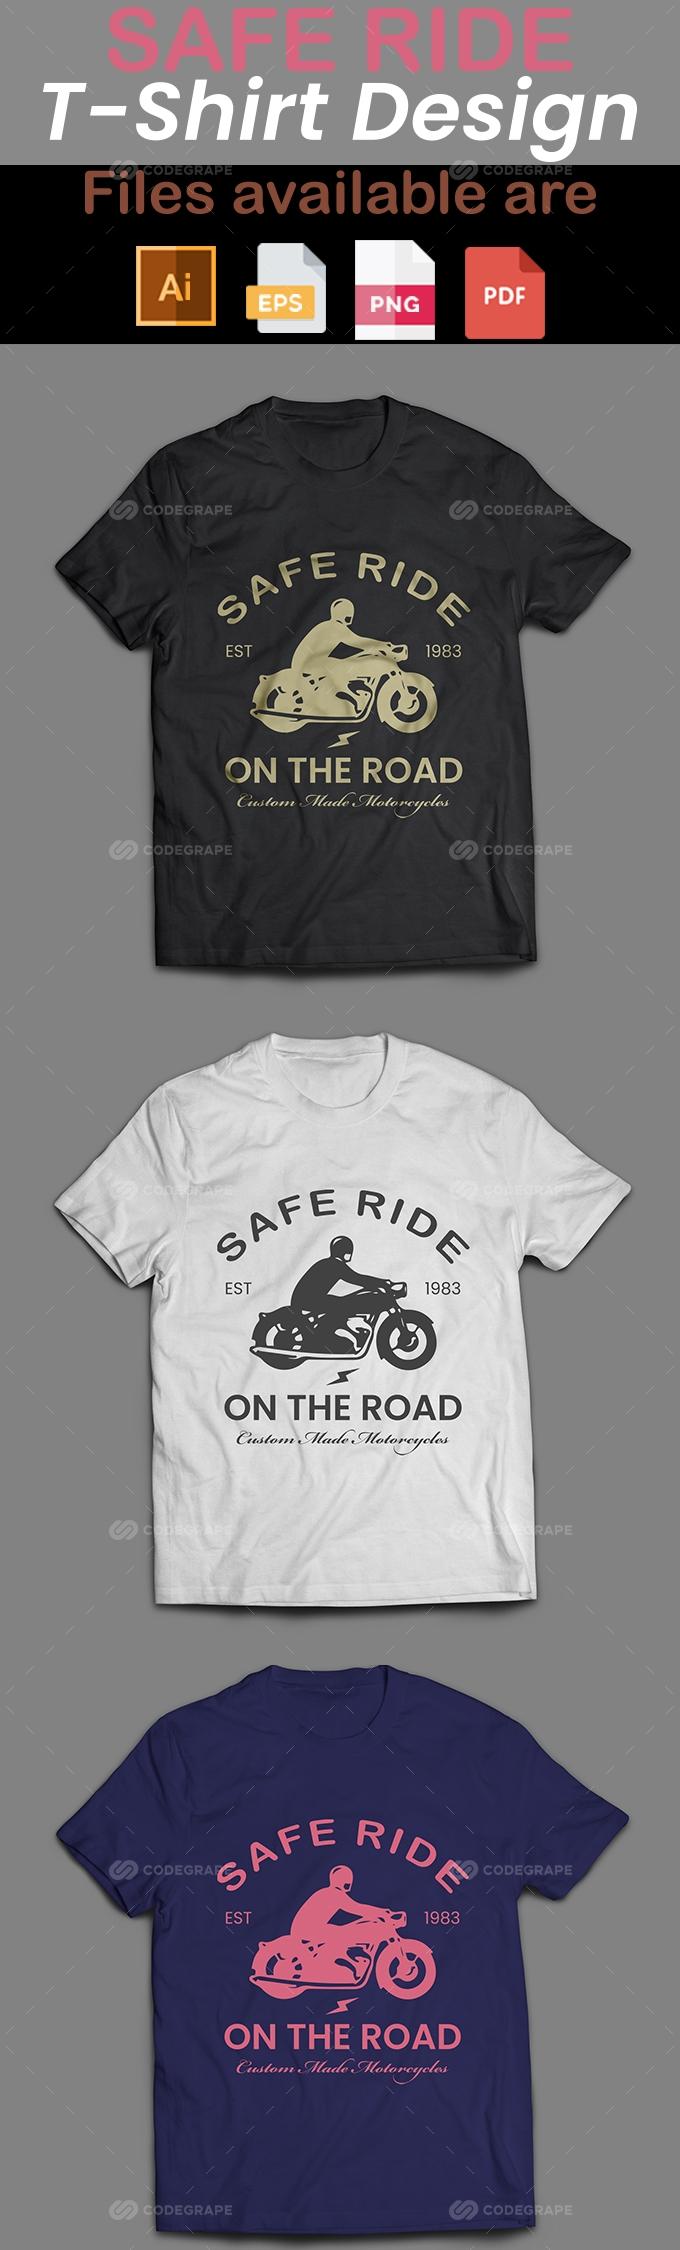 Safe Ride T-Shirt Design